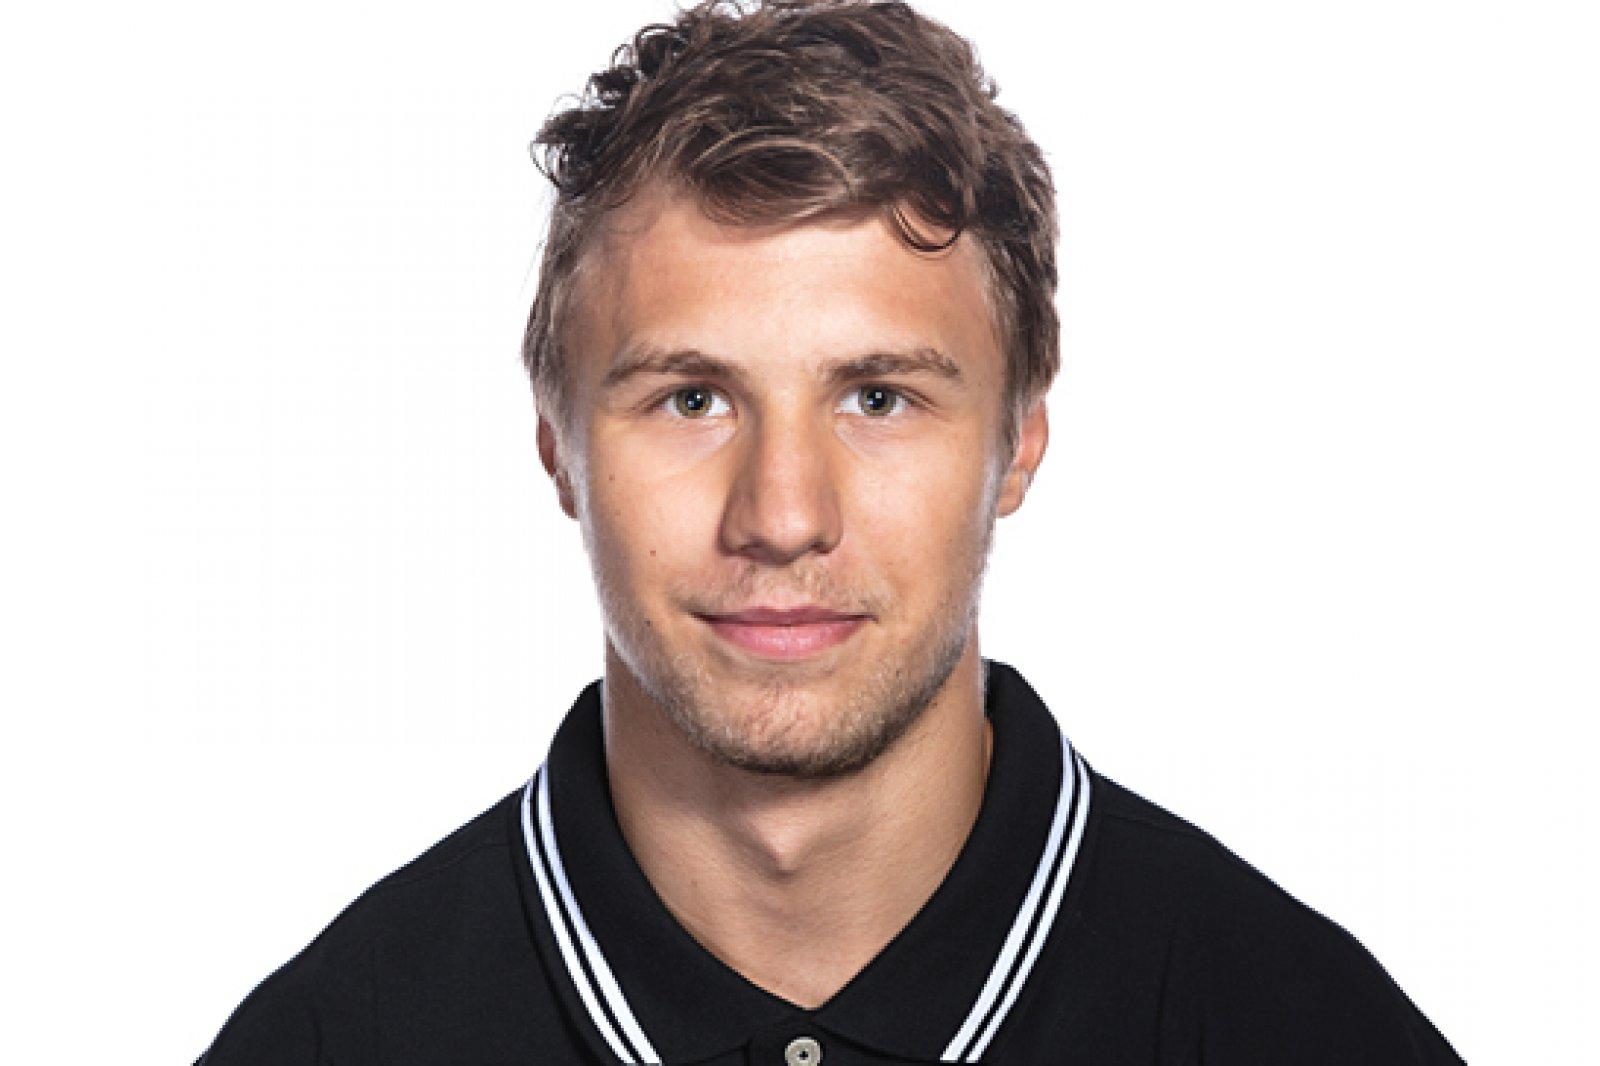 Michal Horký